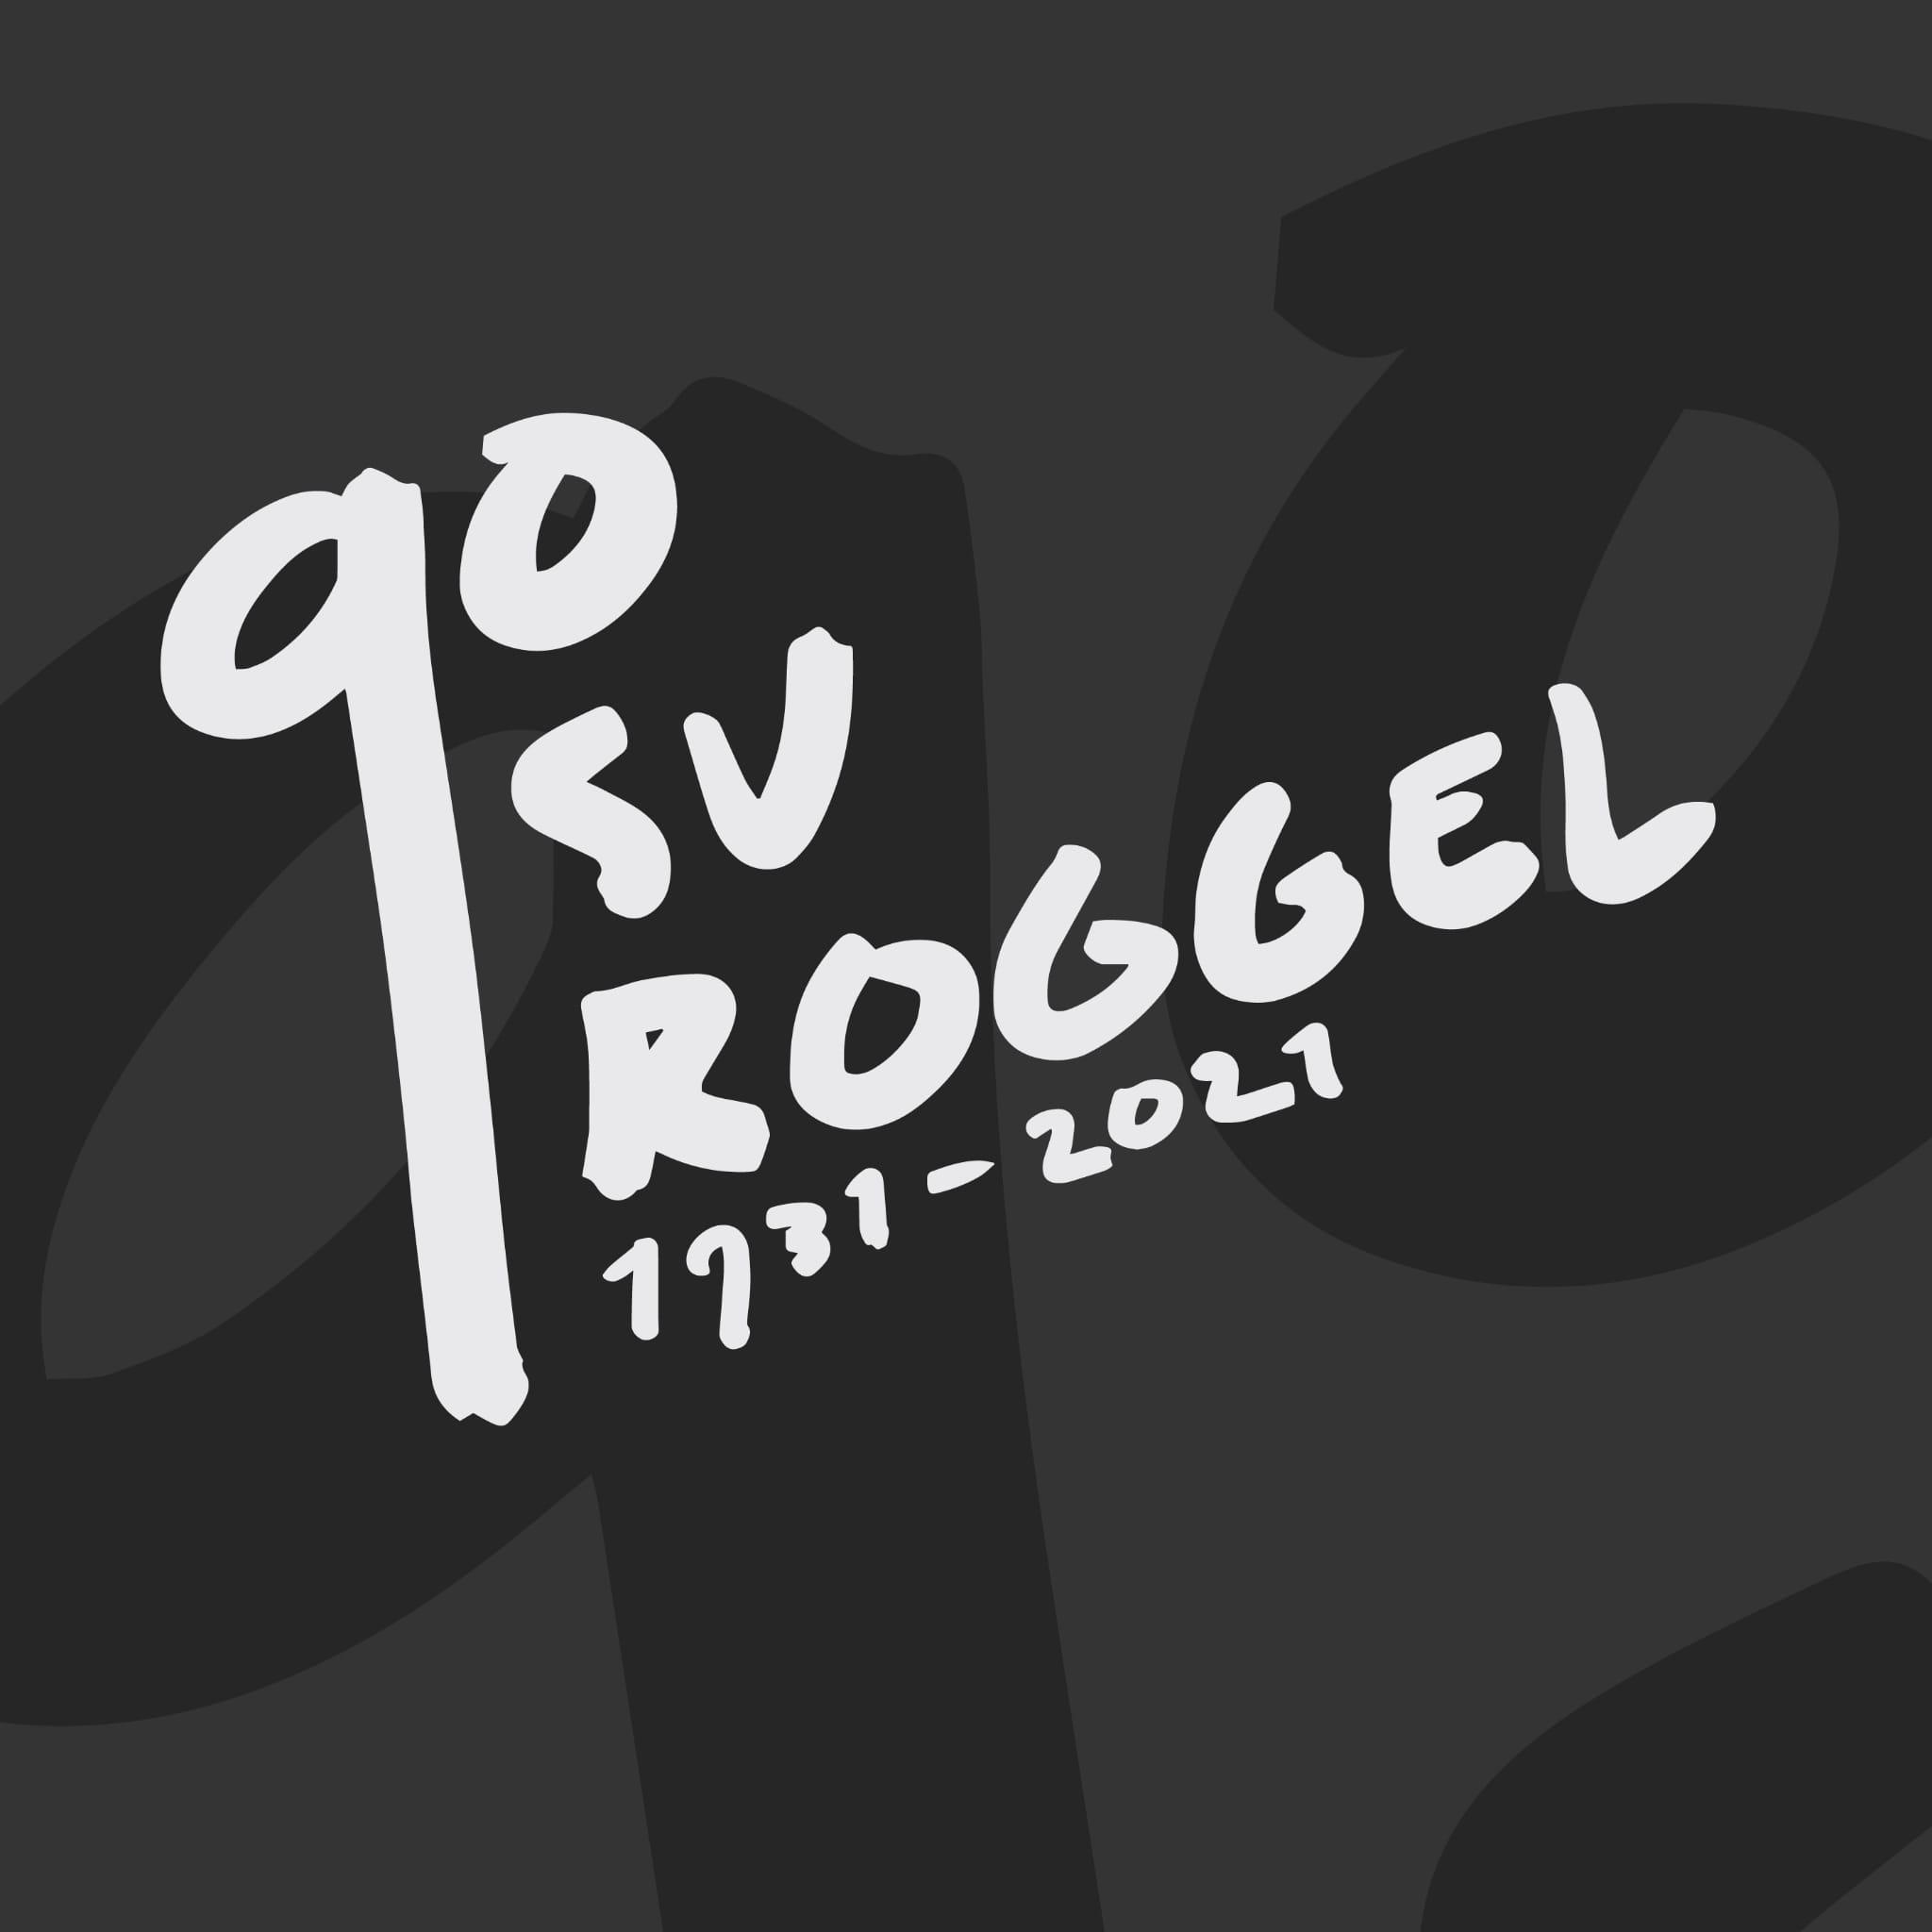 90 minute zeen 90 jaor S.V. Roggel gewaore!